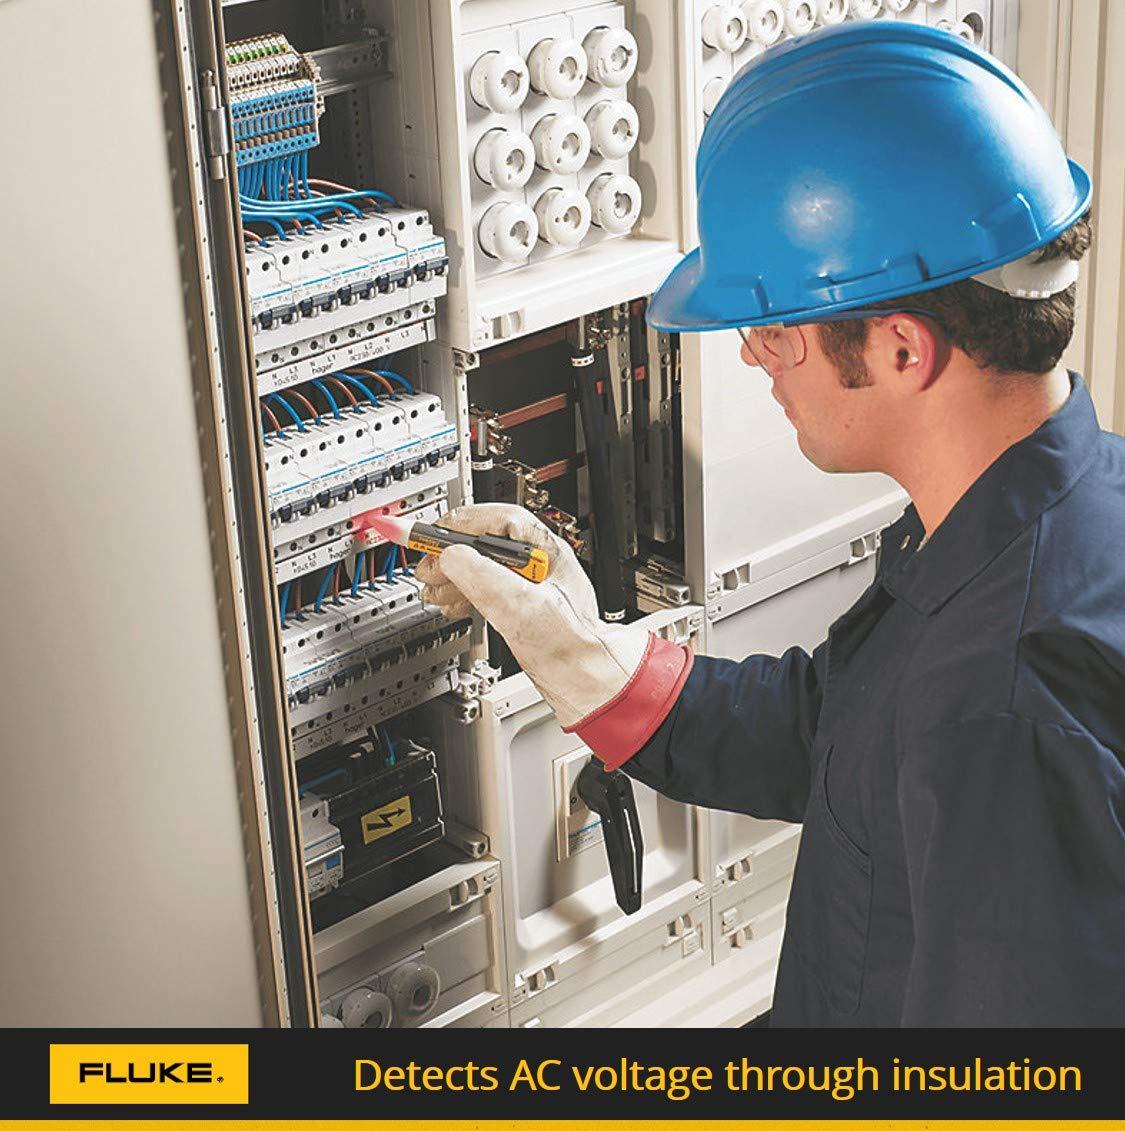 Fluke 1ac A1 Ii Voltalert Non Contact Voltage Tester Circuit Breaker Finder Noncontact And Socket Industrial Scientific